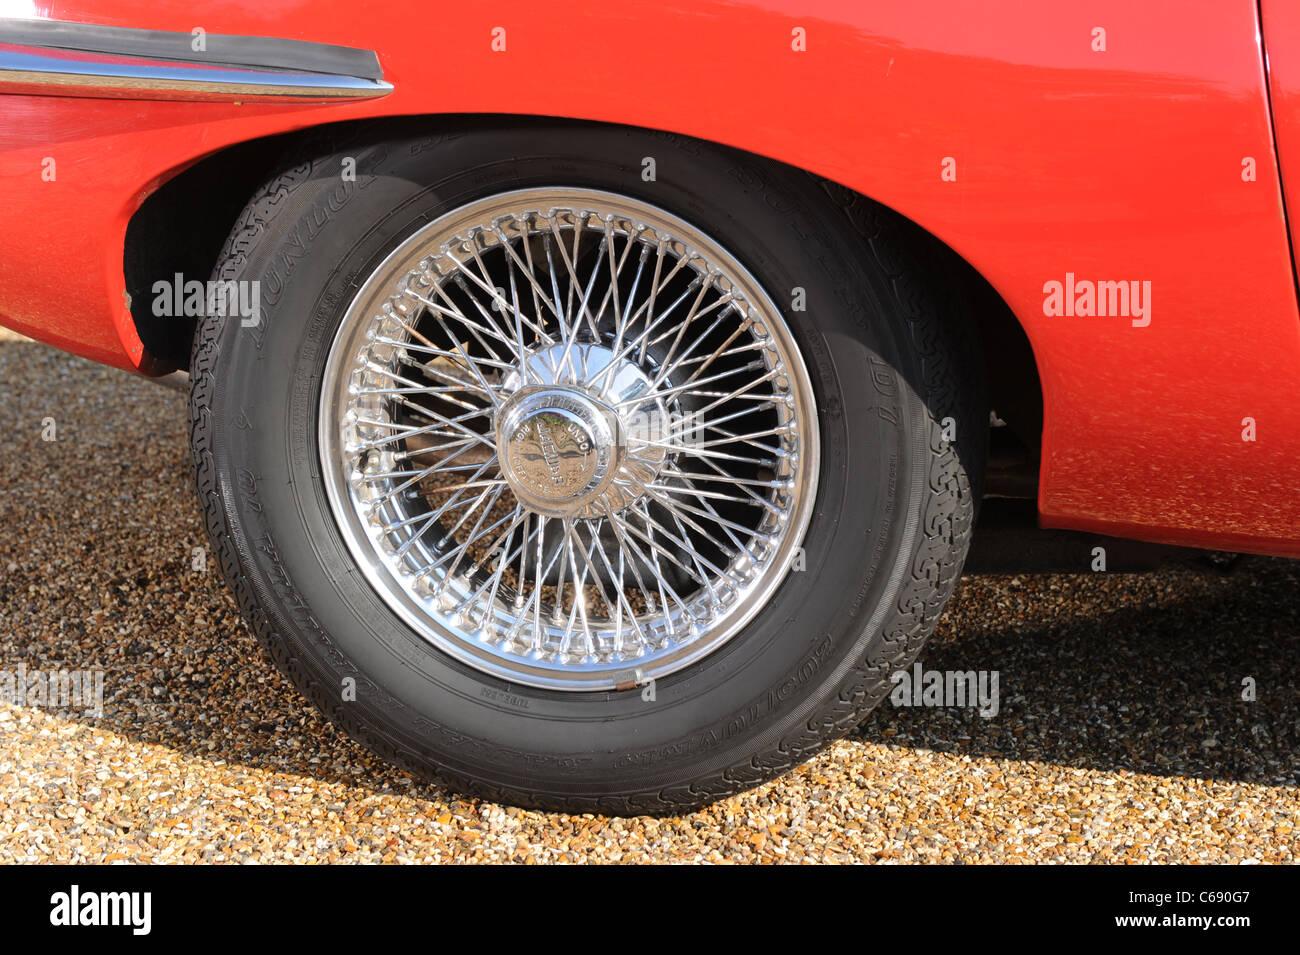 1970 Jaguar Etype series 2 roadster in red - Stock Image